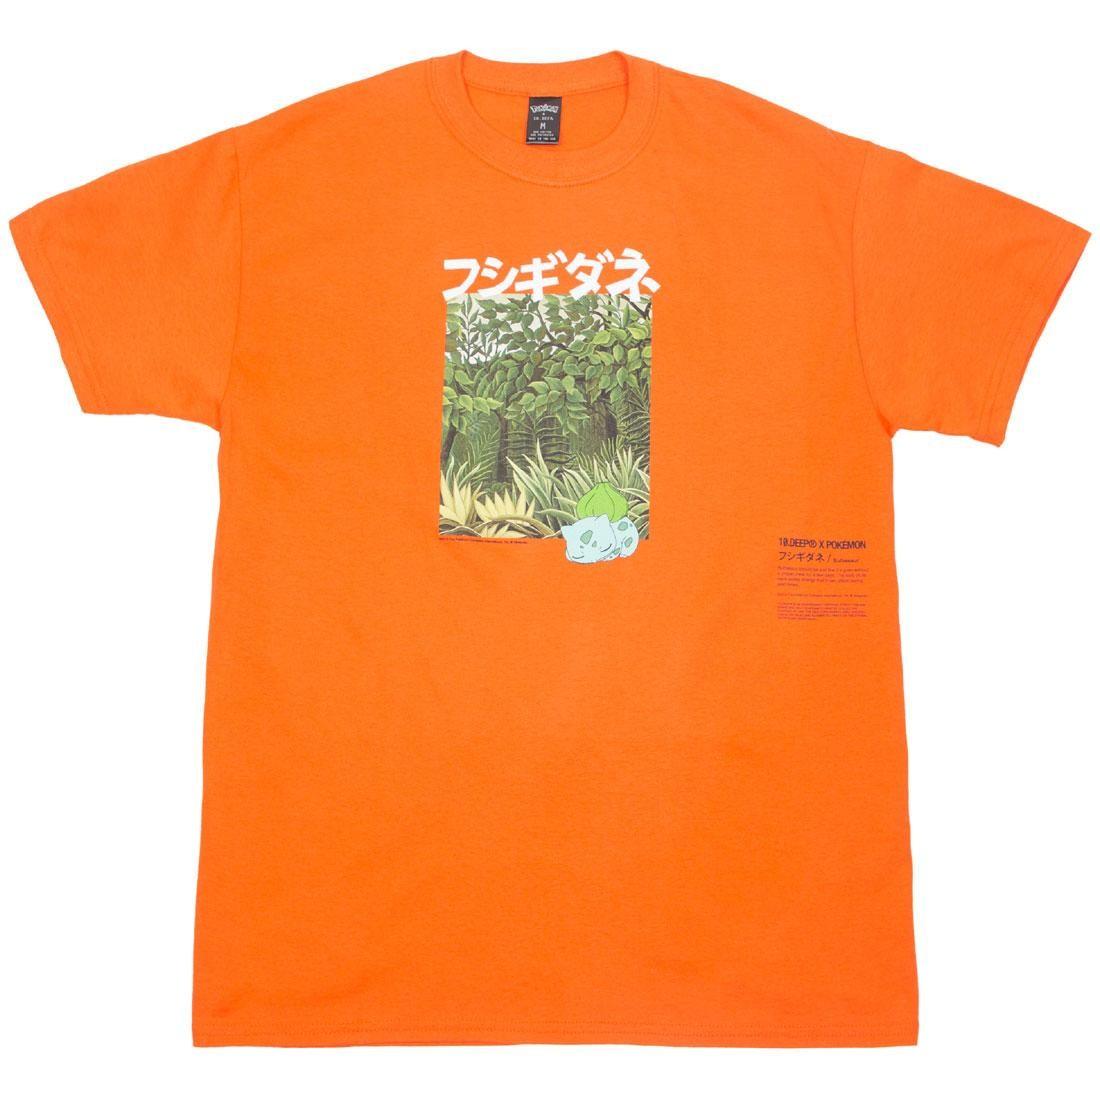 BAIT Exclusive 10 Deep x Pokemon Men Bulbasaur Jungle Tee (orange)